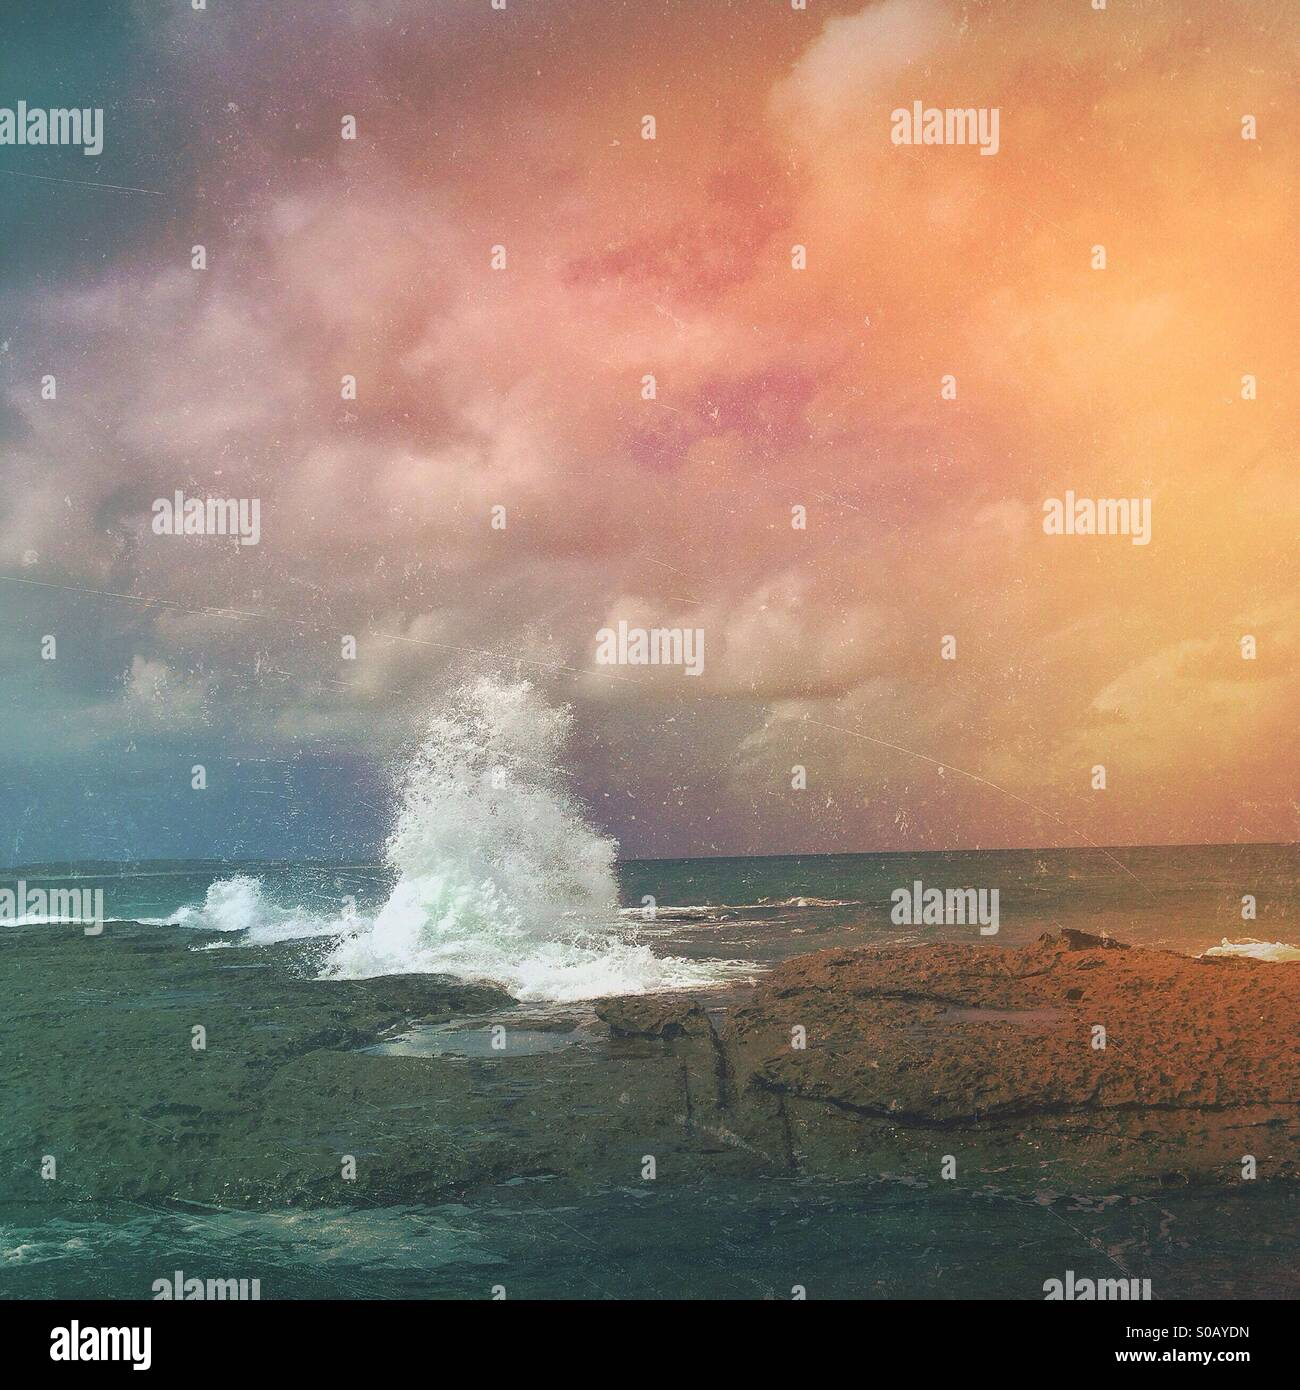 Oceans - Stock Image